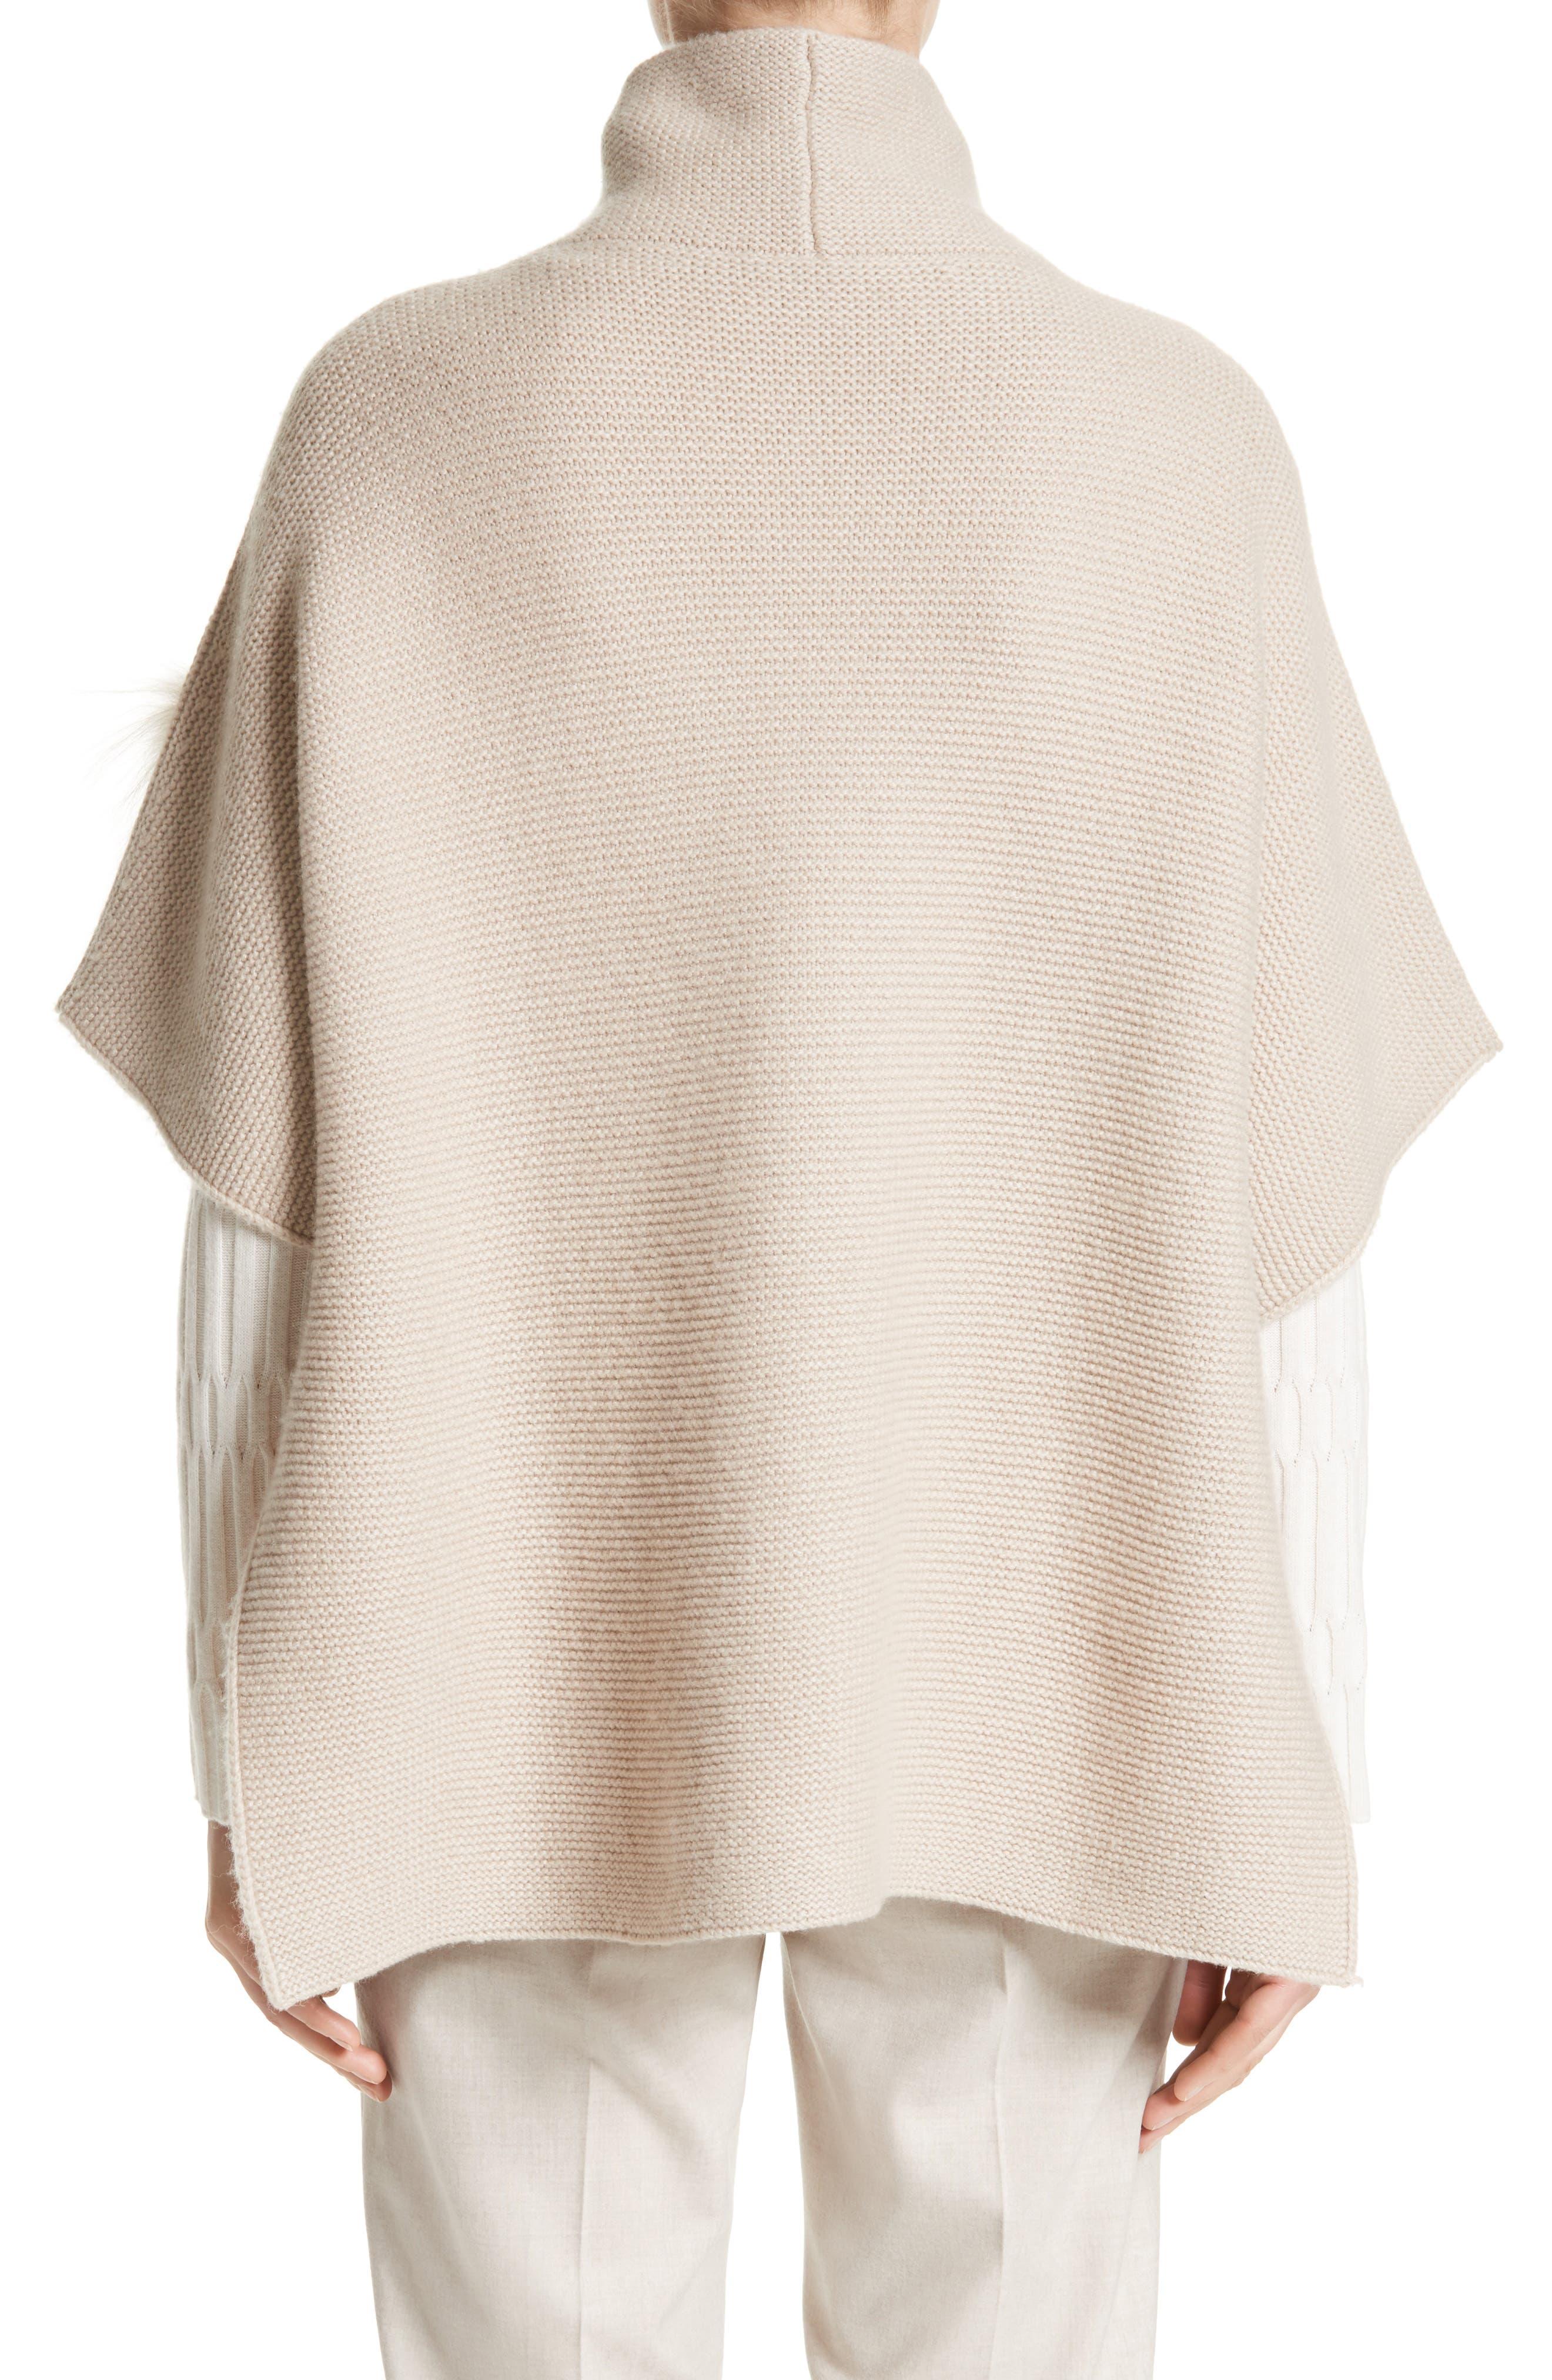 Alternate Image 2  - Fabiana Filippi Micro Braid Cashmere Zip Cardigan with Genuine Fox Fur Trim